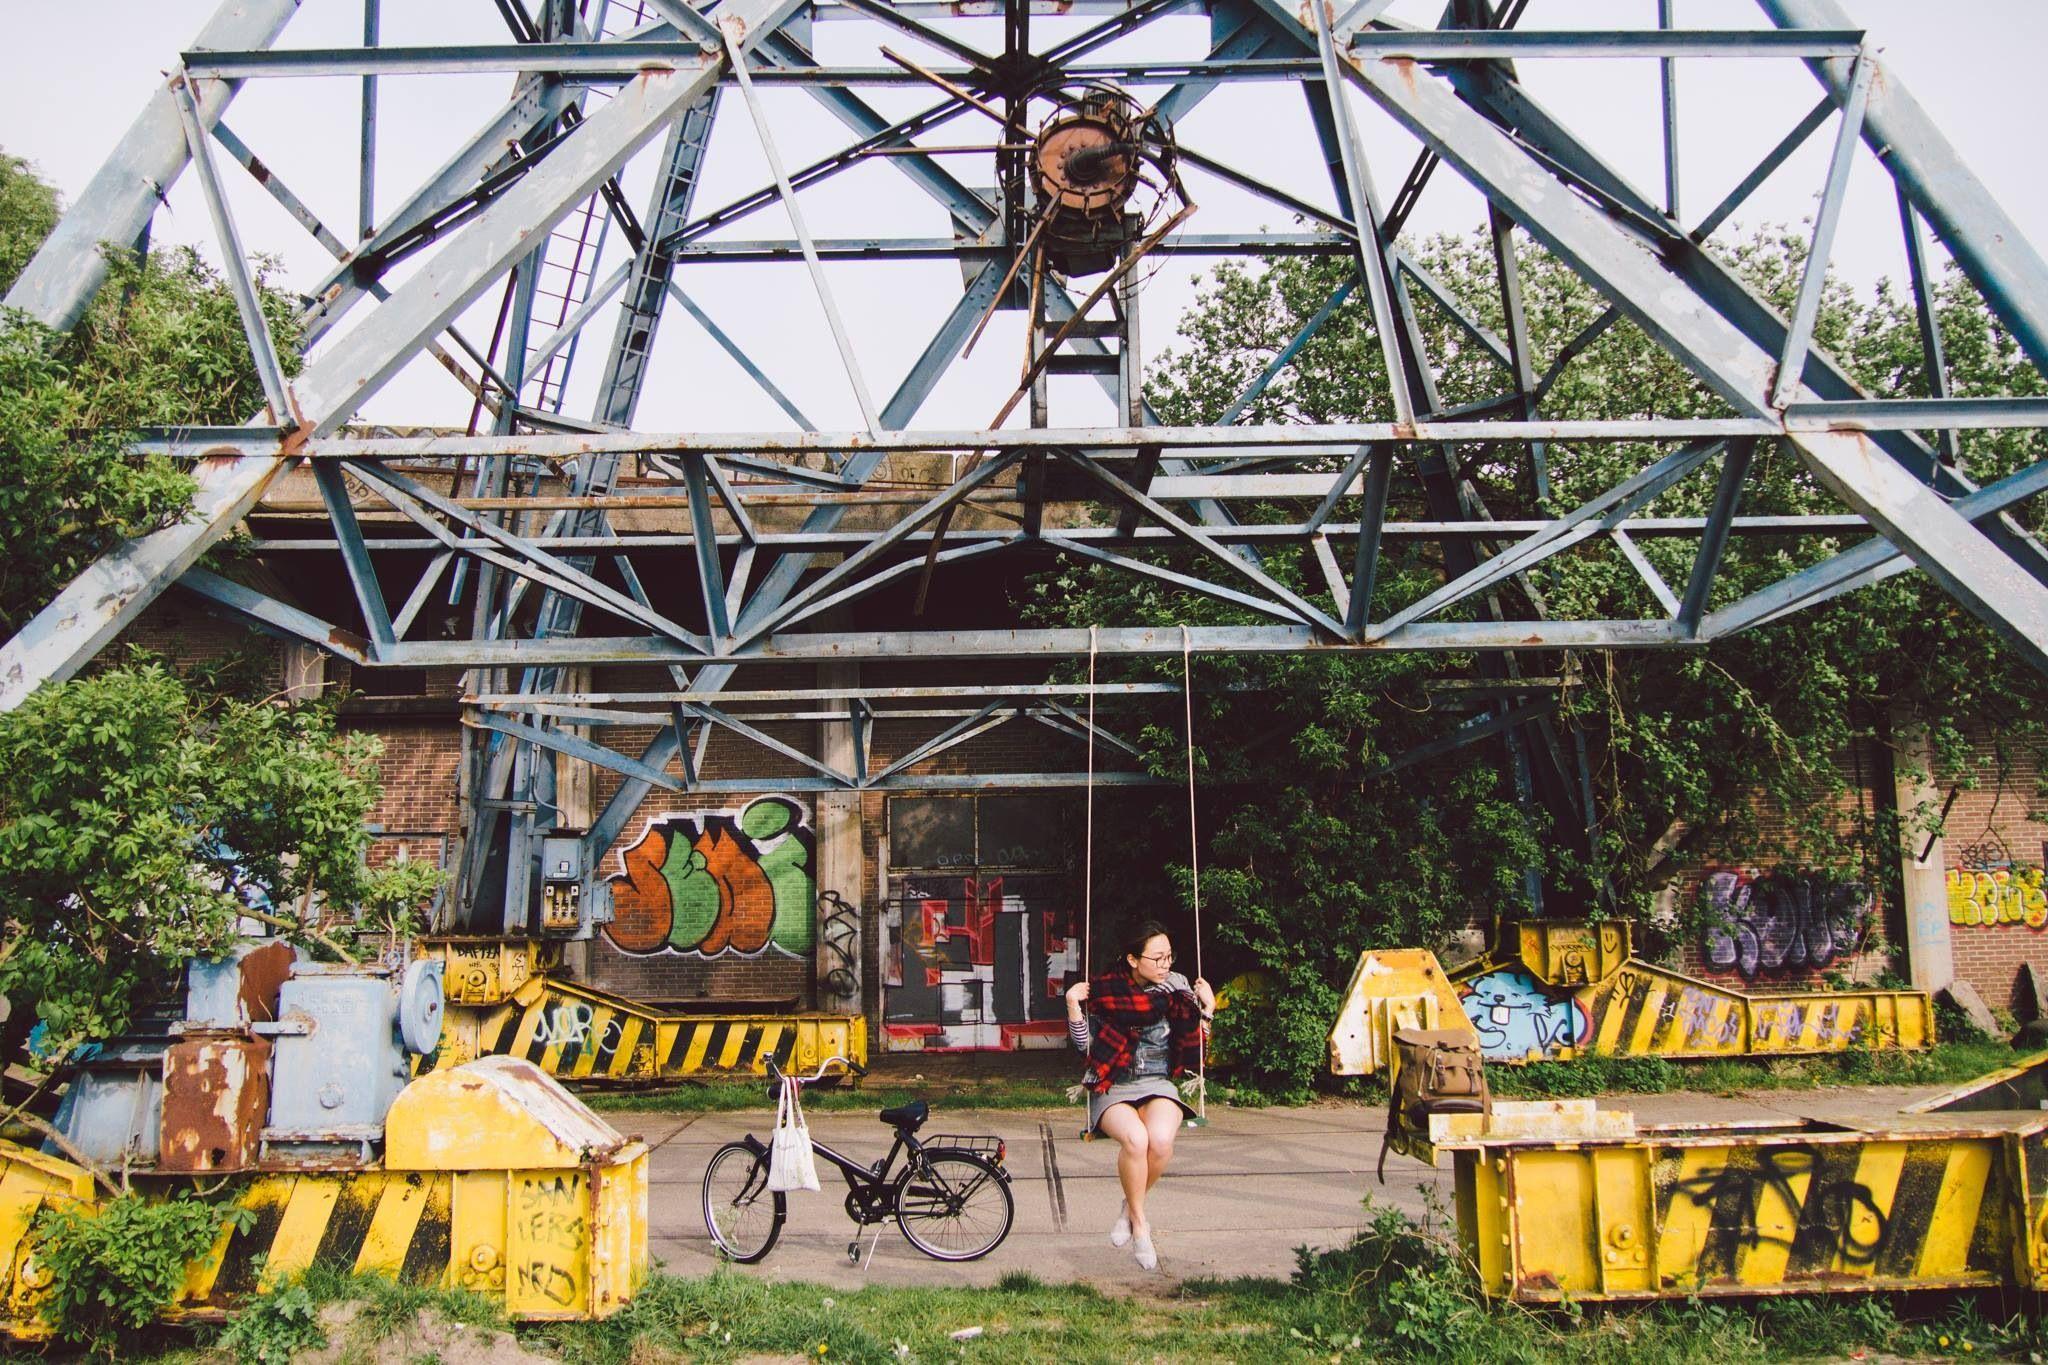 #amsterdam 今日的天氣比昨天好,一早出門就有陽光。我們當然非常珍惜,立即騎著單車出門。今日我們打算去做文藝青年,向荷蘭當代藝術館(Stedelijk Museum Amsterdam) 出發! #netherland #holland #travel #bike #industry